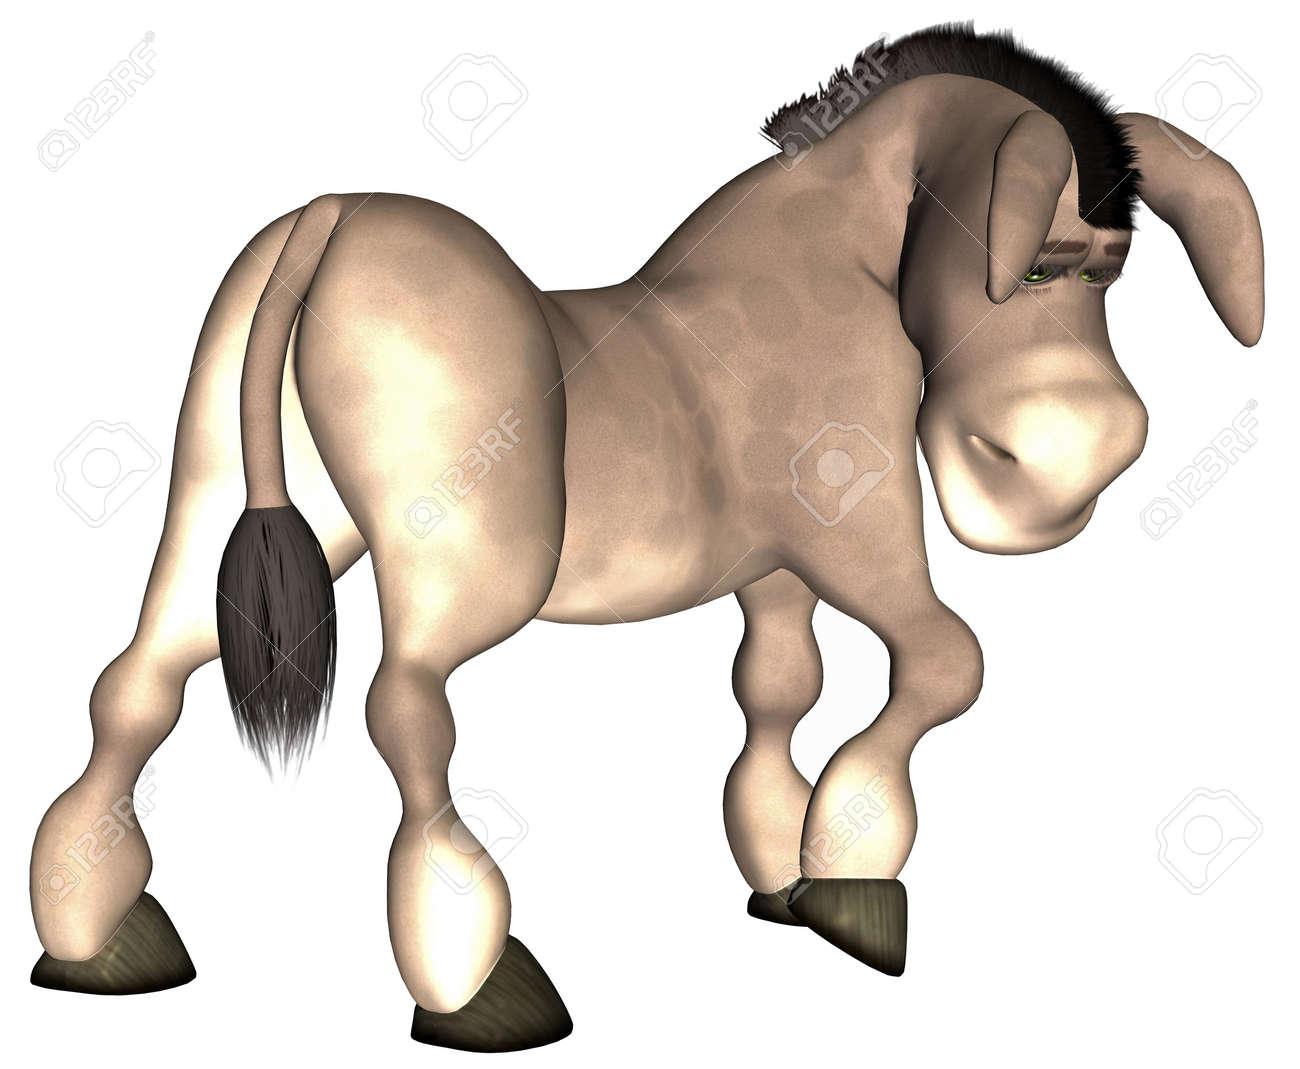 Illustration of a cartoon donkey isolated on a white background Stock Photo - 12675208